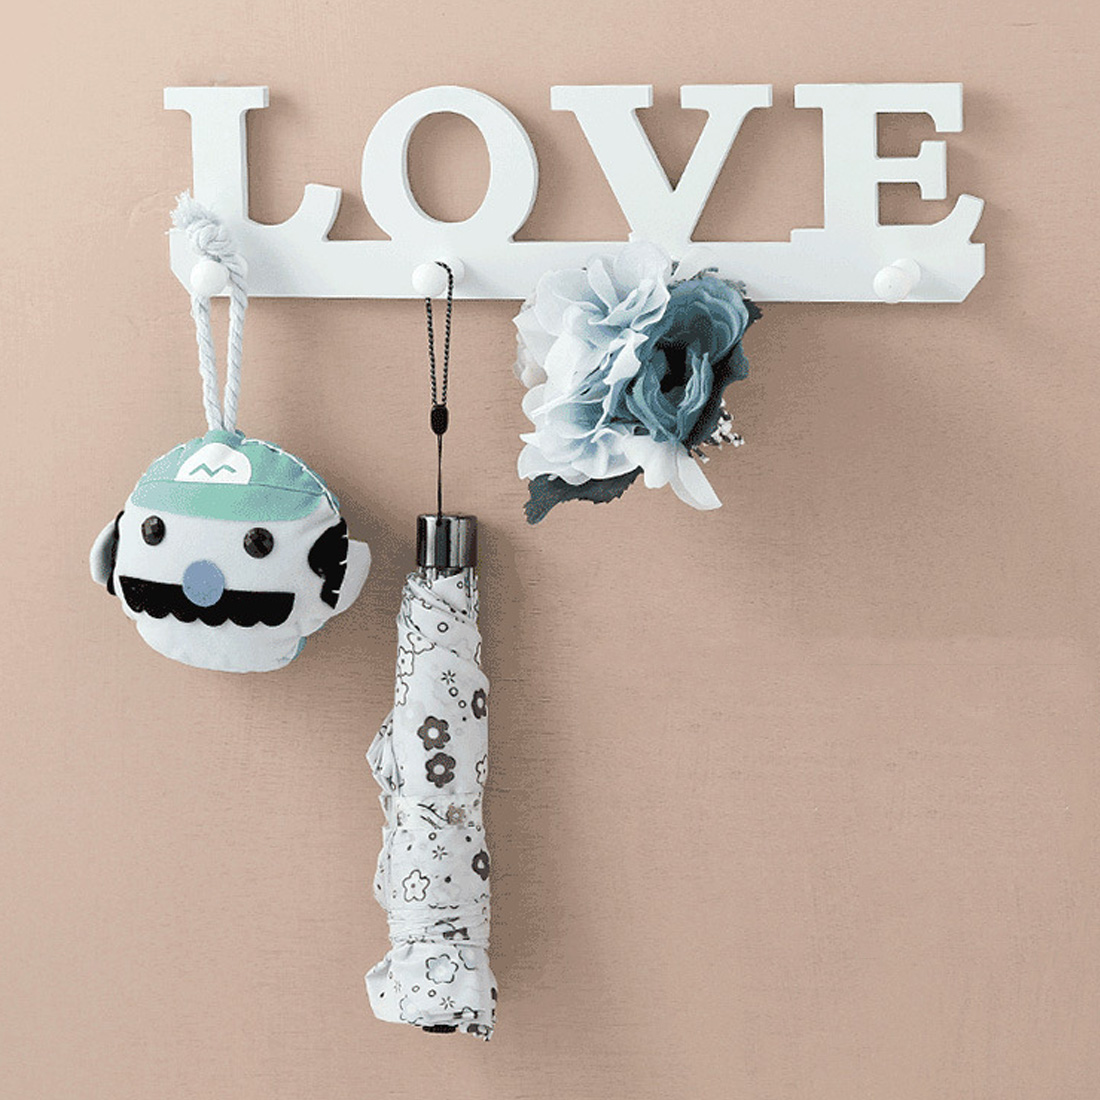 Retro white love hat hat key ring clothes bag robes hanging screw ledge door bathroom home decoration hanger key ring wall hook|Hooks & Rails| |  -